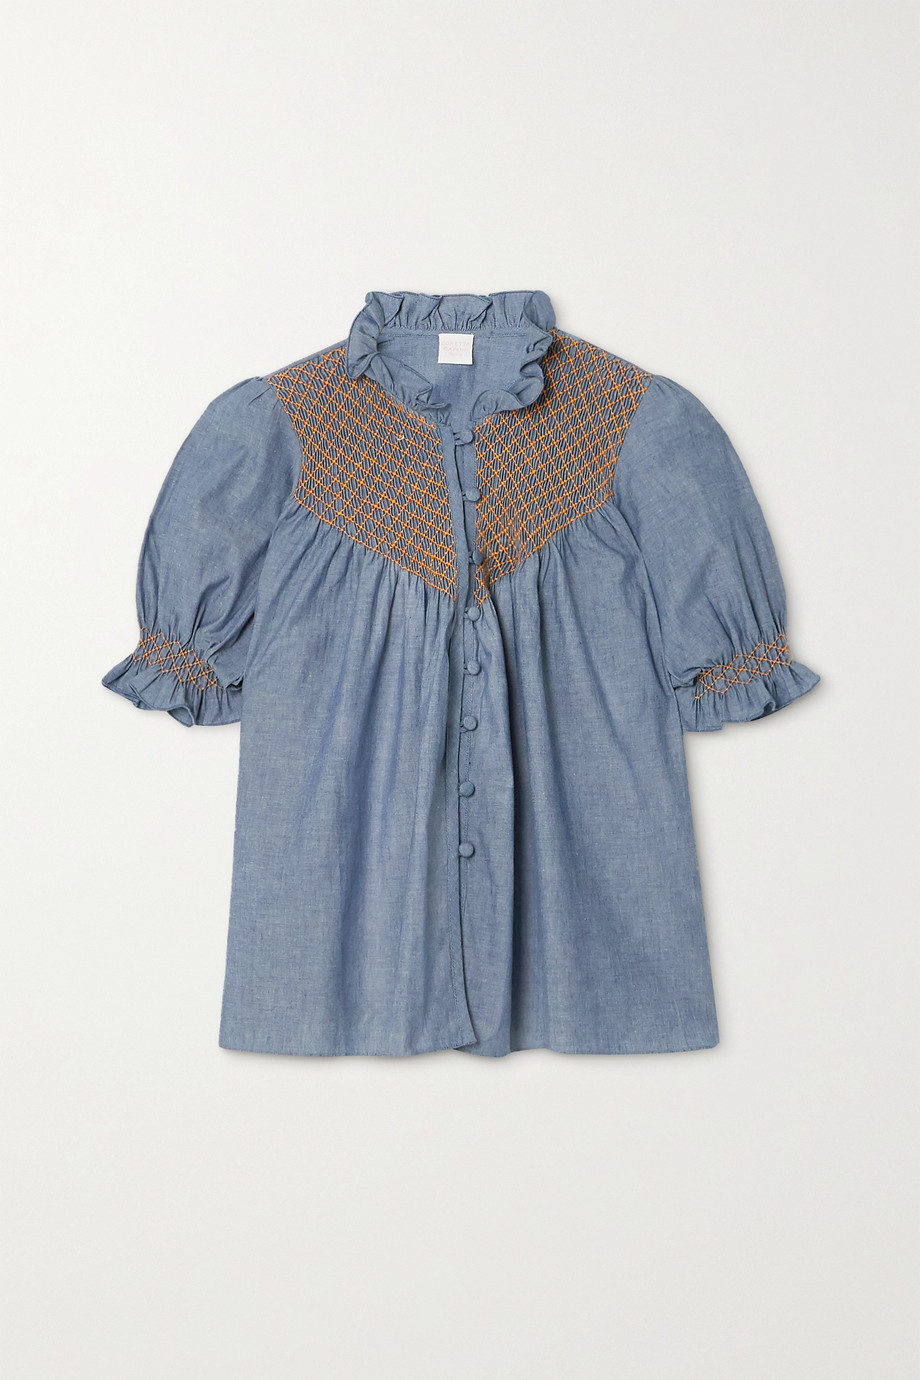 Loretta Caponi Milvia ruffled smocked cotton-chambray blouse